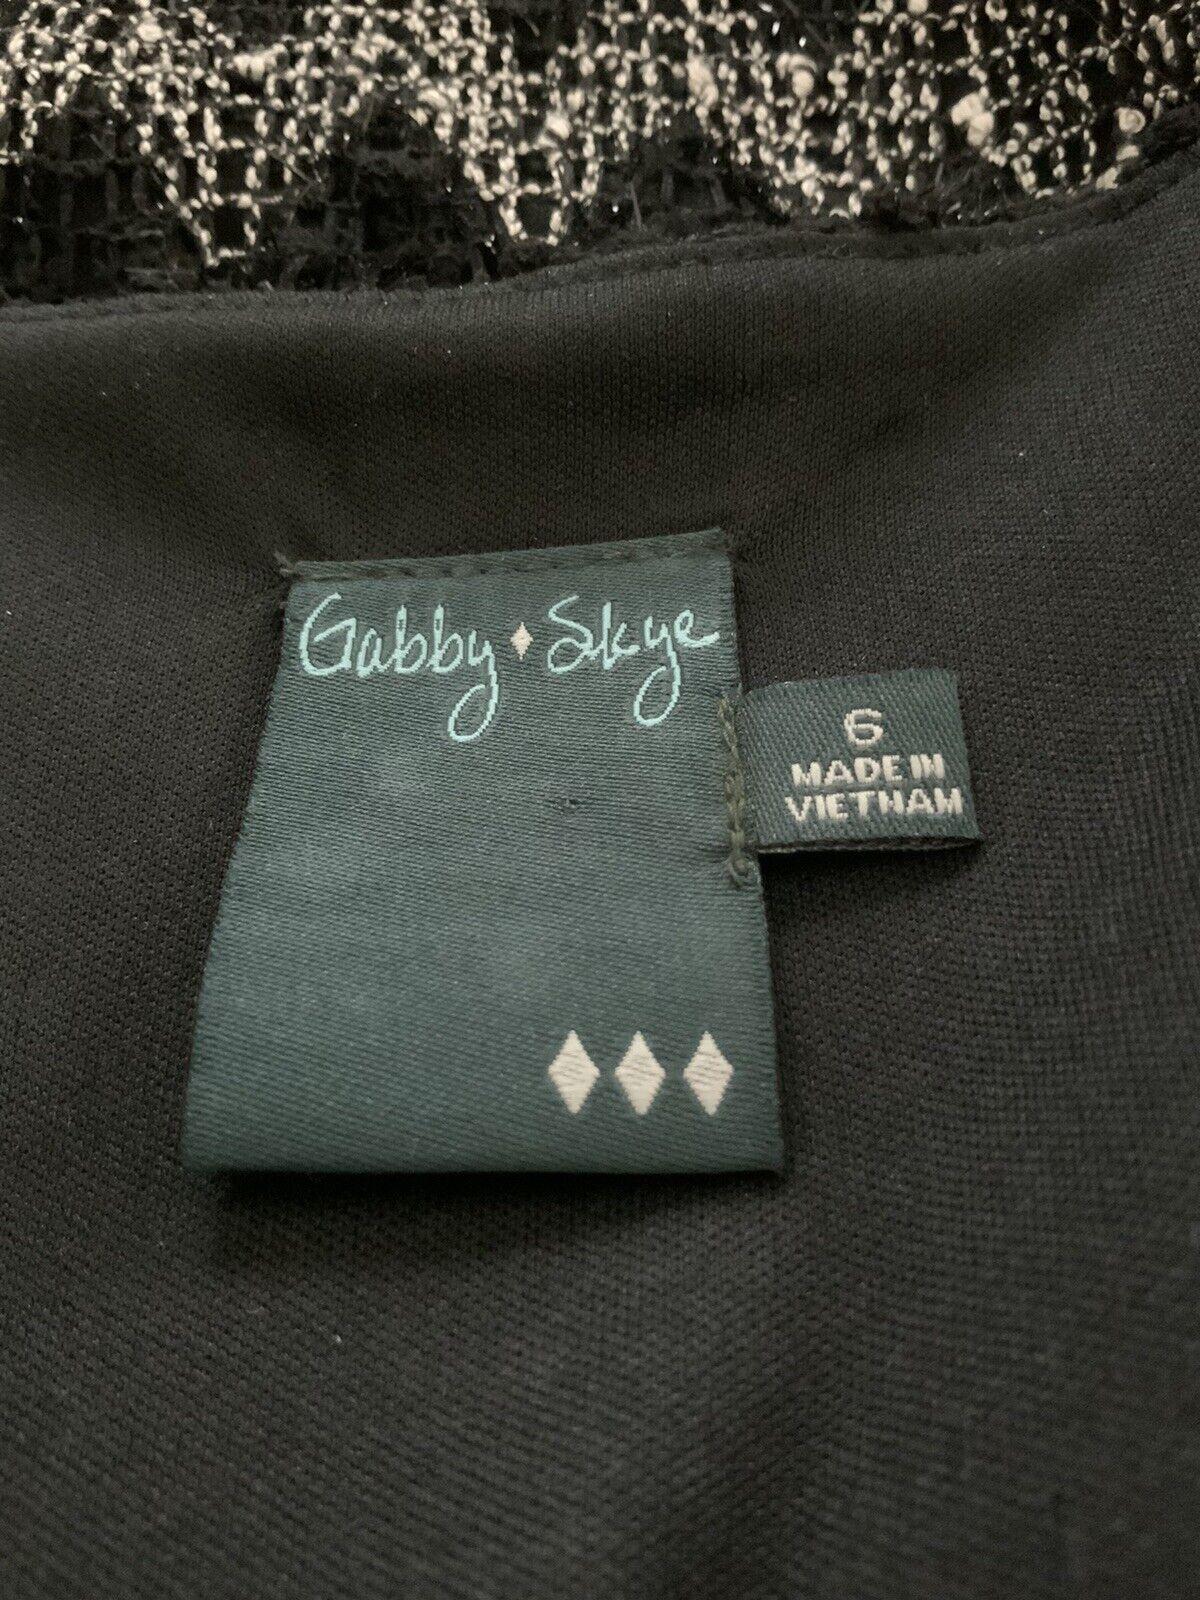 Gabby Skye Dress Size 6 Black & White Lace Shell … - image 4